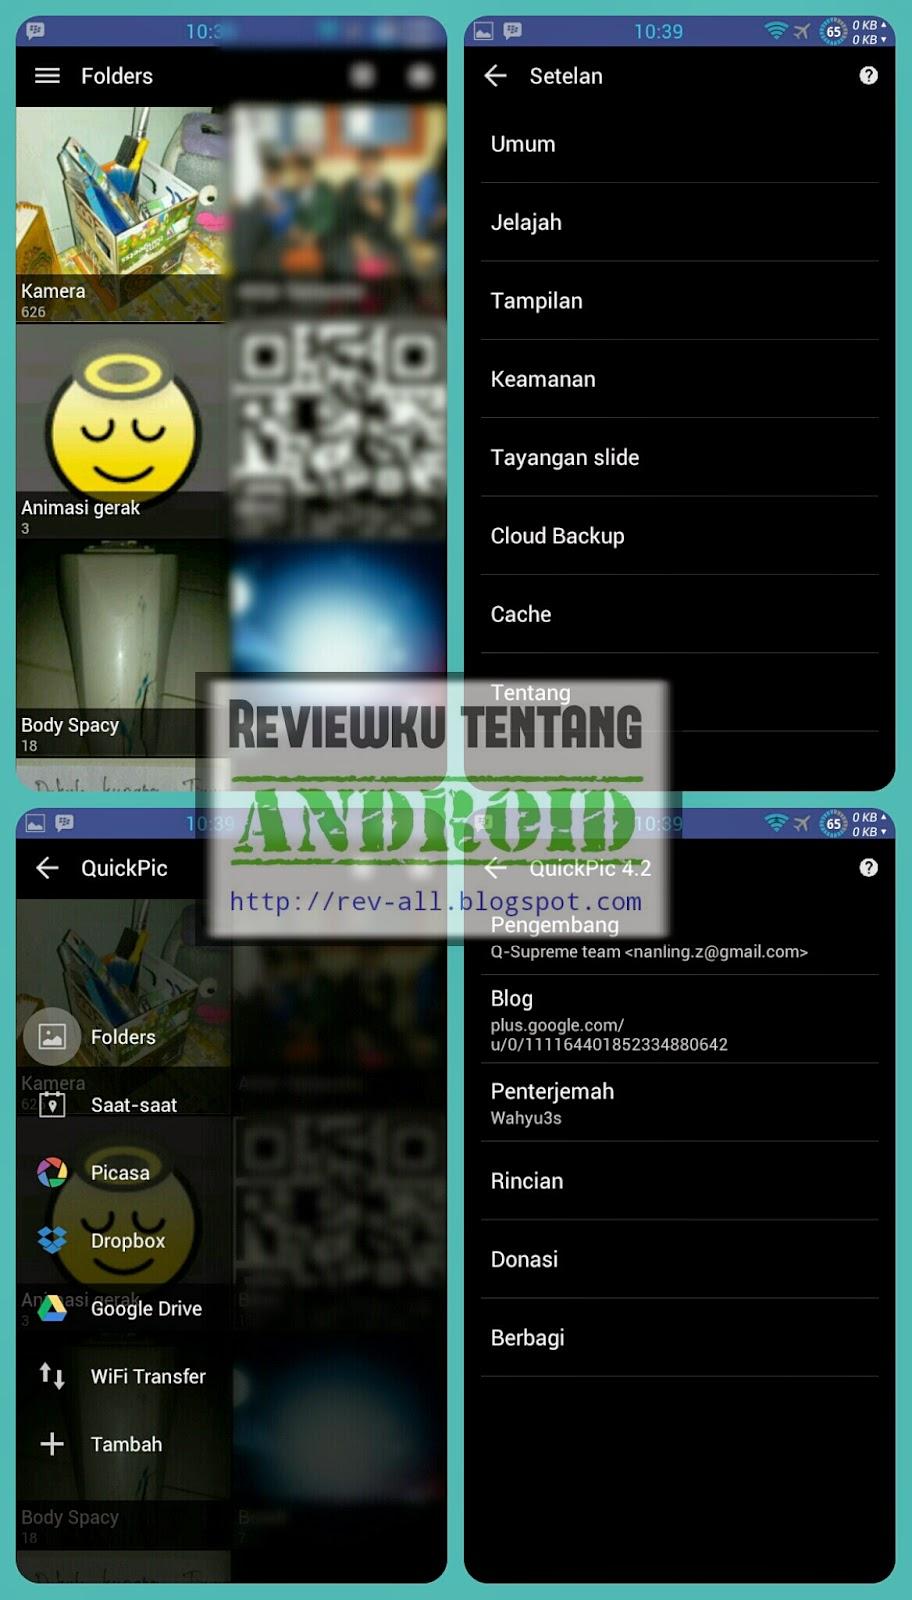 Tampilan aplikasi QUICKPIC - galeri mungil yang powerful untuk android (rev-all.blogspot.com)